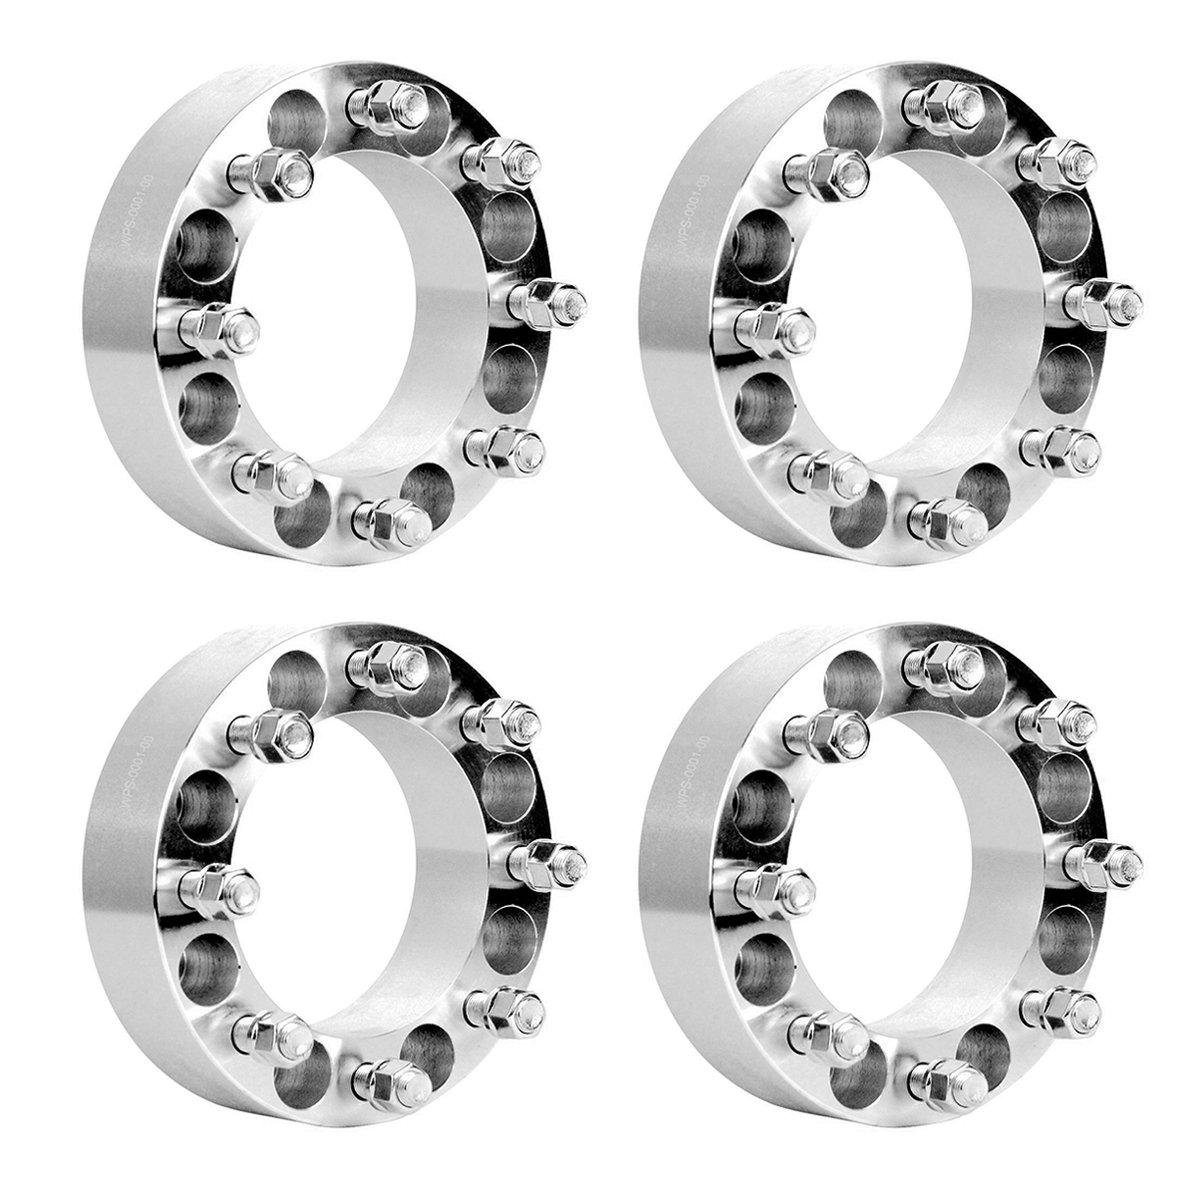 TargetEvo 4pcs 8x6.5 to 8x6.5 (8x165.1mm) 2'' Thickness Wheel Spacers Adapters 9/16'' STUDS for Dodge Ram 2500 Ram 3500 W250 W300